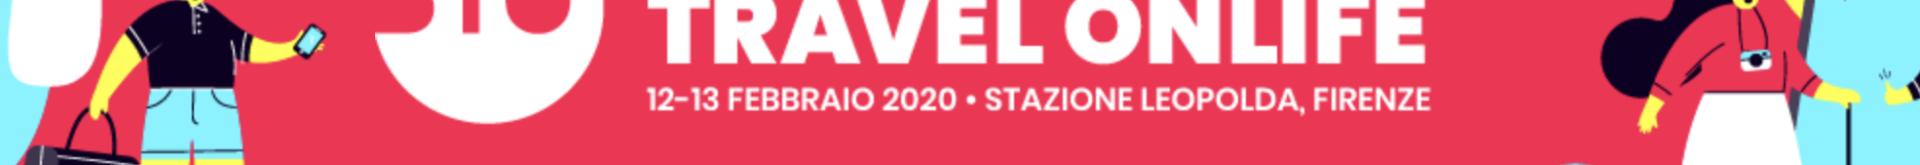 BTO2020 SAVE THE DATE: 12 e 13 febbraio 2020 a Firenze